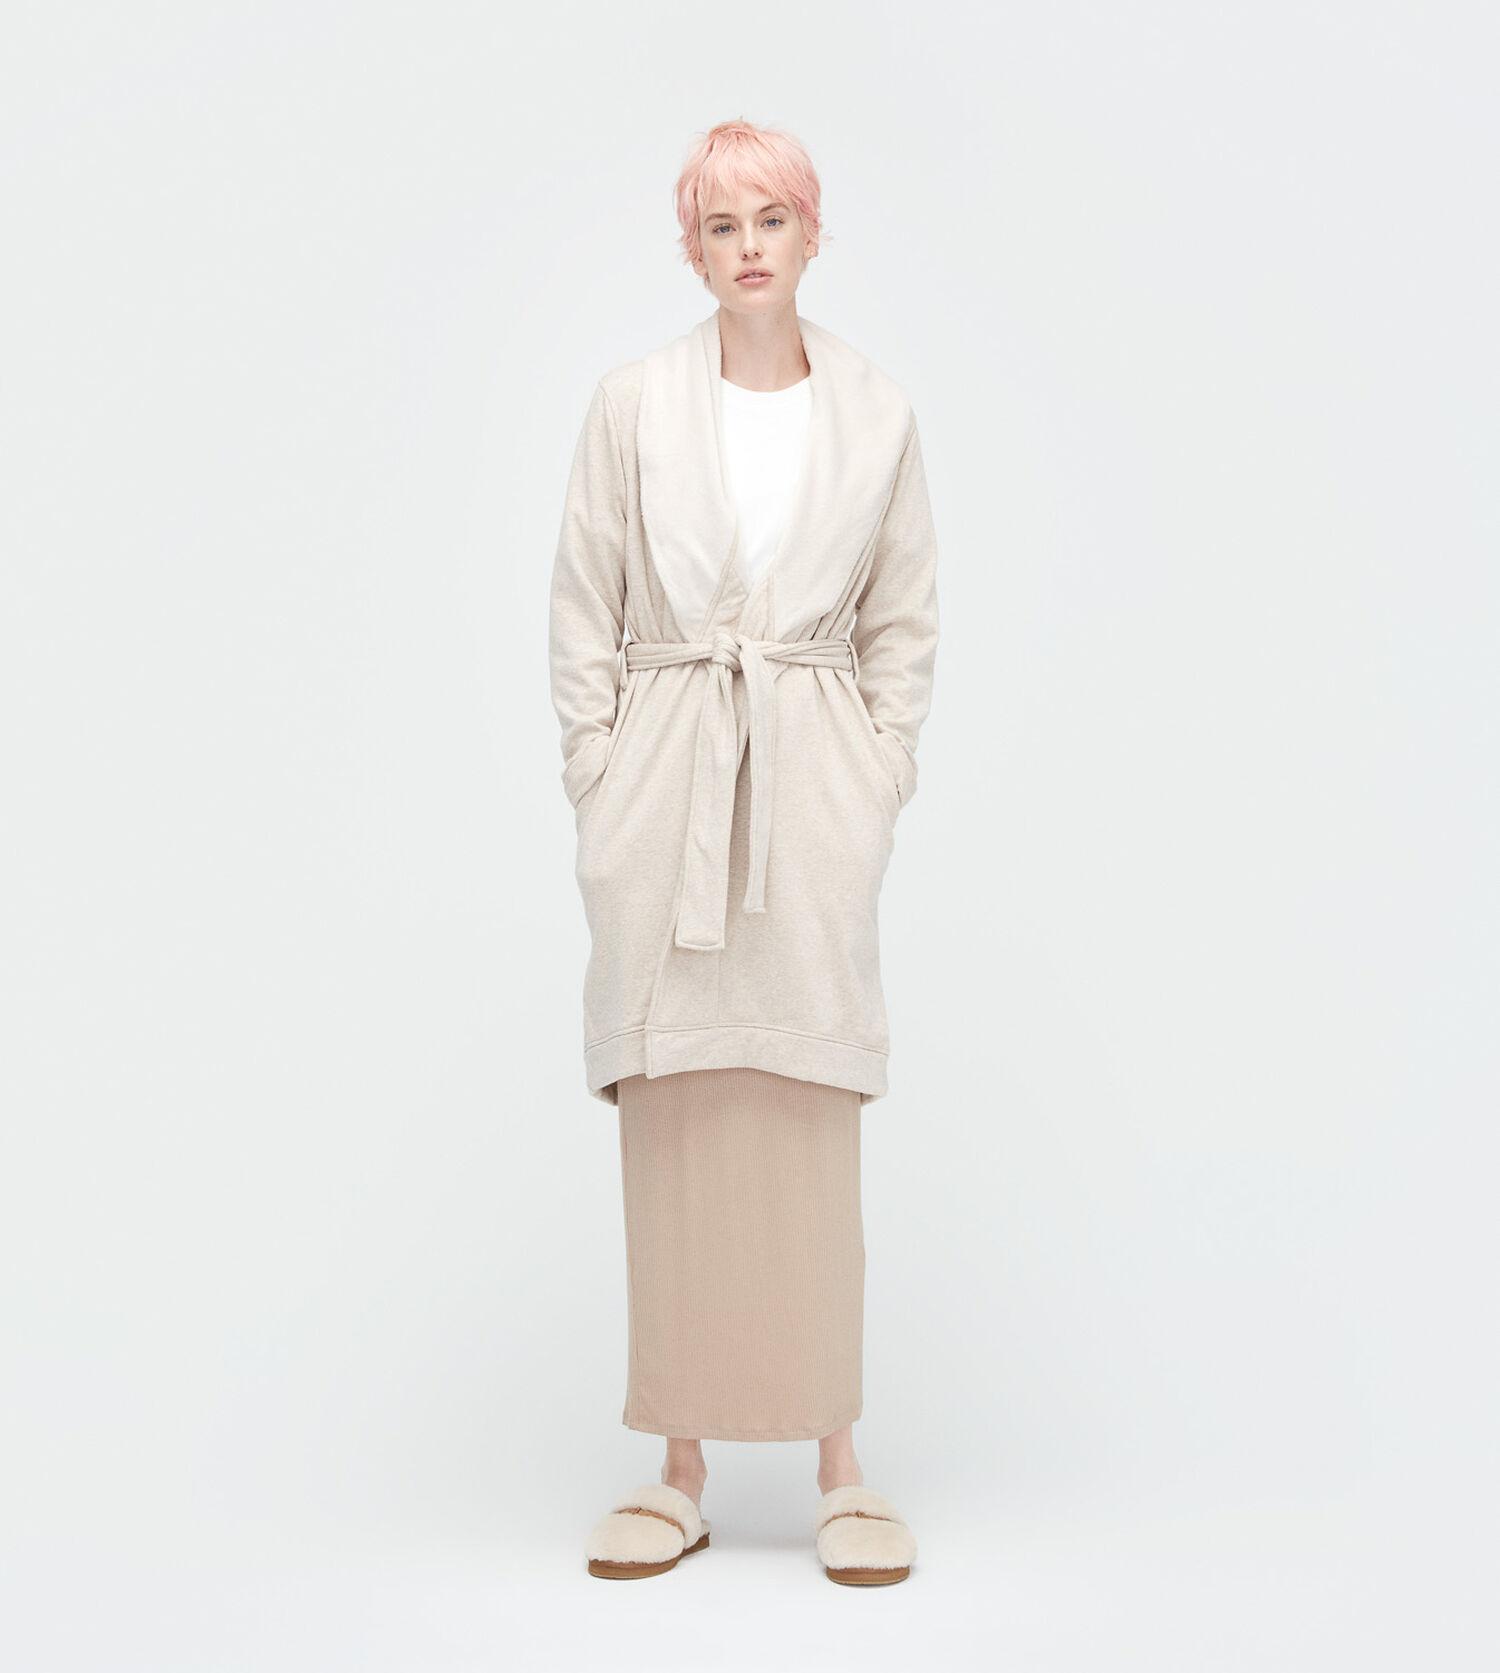 7ed43b5d90 Zoom Blanche II Robe - Image 3 of 4